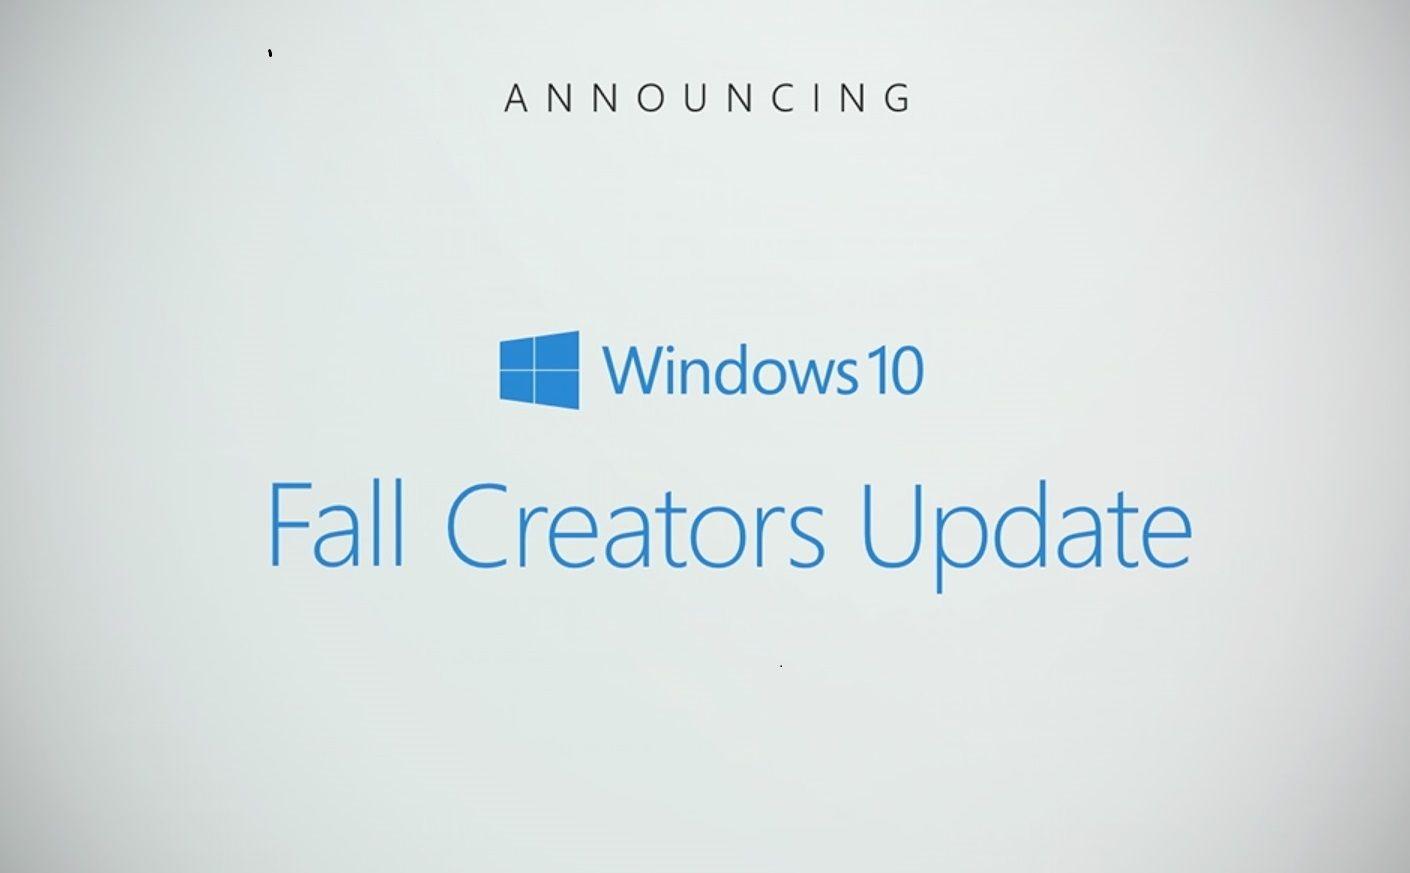 Windows 10 秋季创作者更新 10 月 17 日发布;马化腾携高管到访苹果总部 | 极客早知道